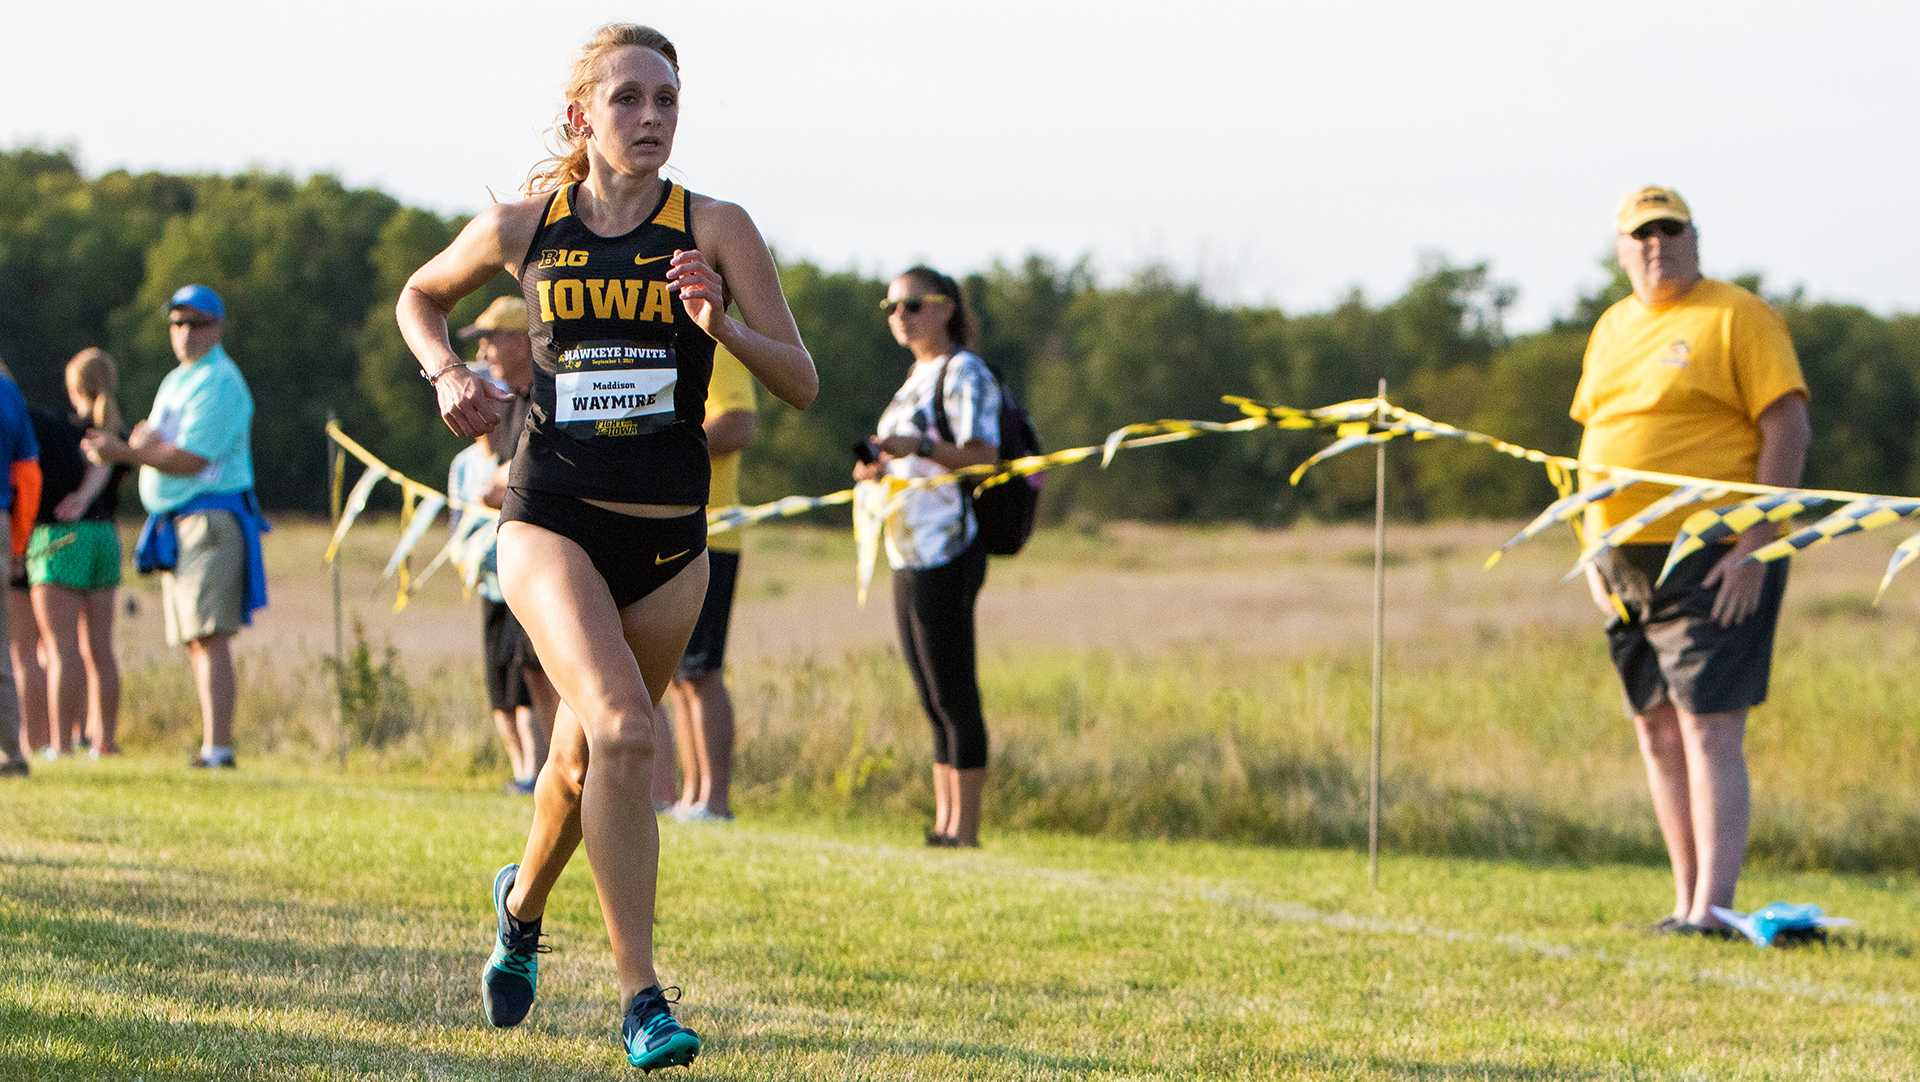 Madison Waymire runs down the chute to the finish line at the Hawkeye Invitational Cross Country meet on Friday, September 1, 2017. (David Harmantas/The Daily Iowan)